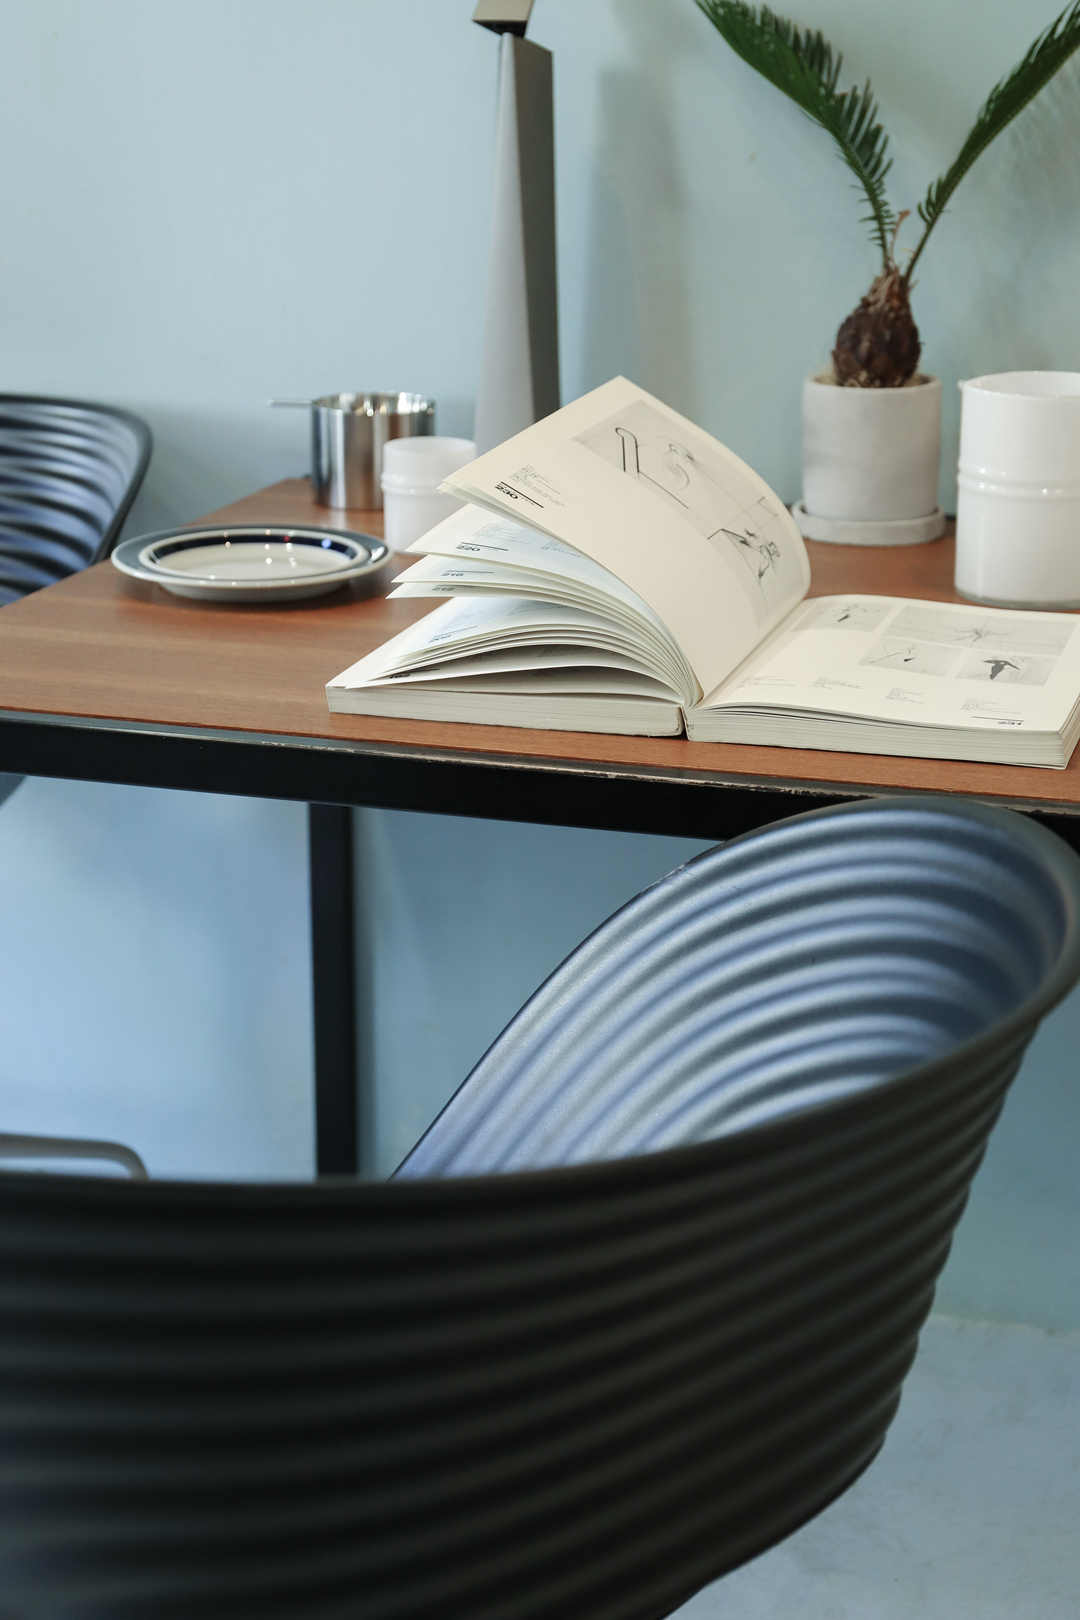 vitra Tom Roll Caster Chair Ron Arad/ヴィトラ トムロール キャスターチェア ロン・アラッド トムバック 椅子 モダン